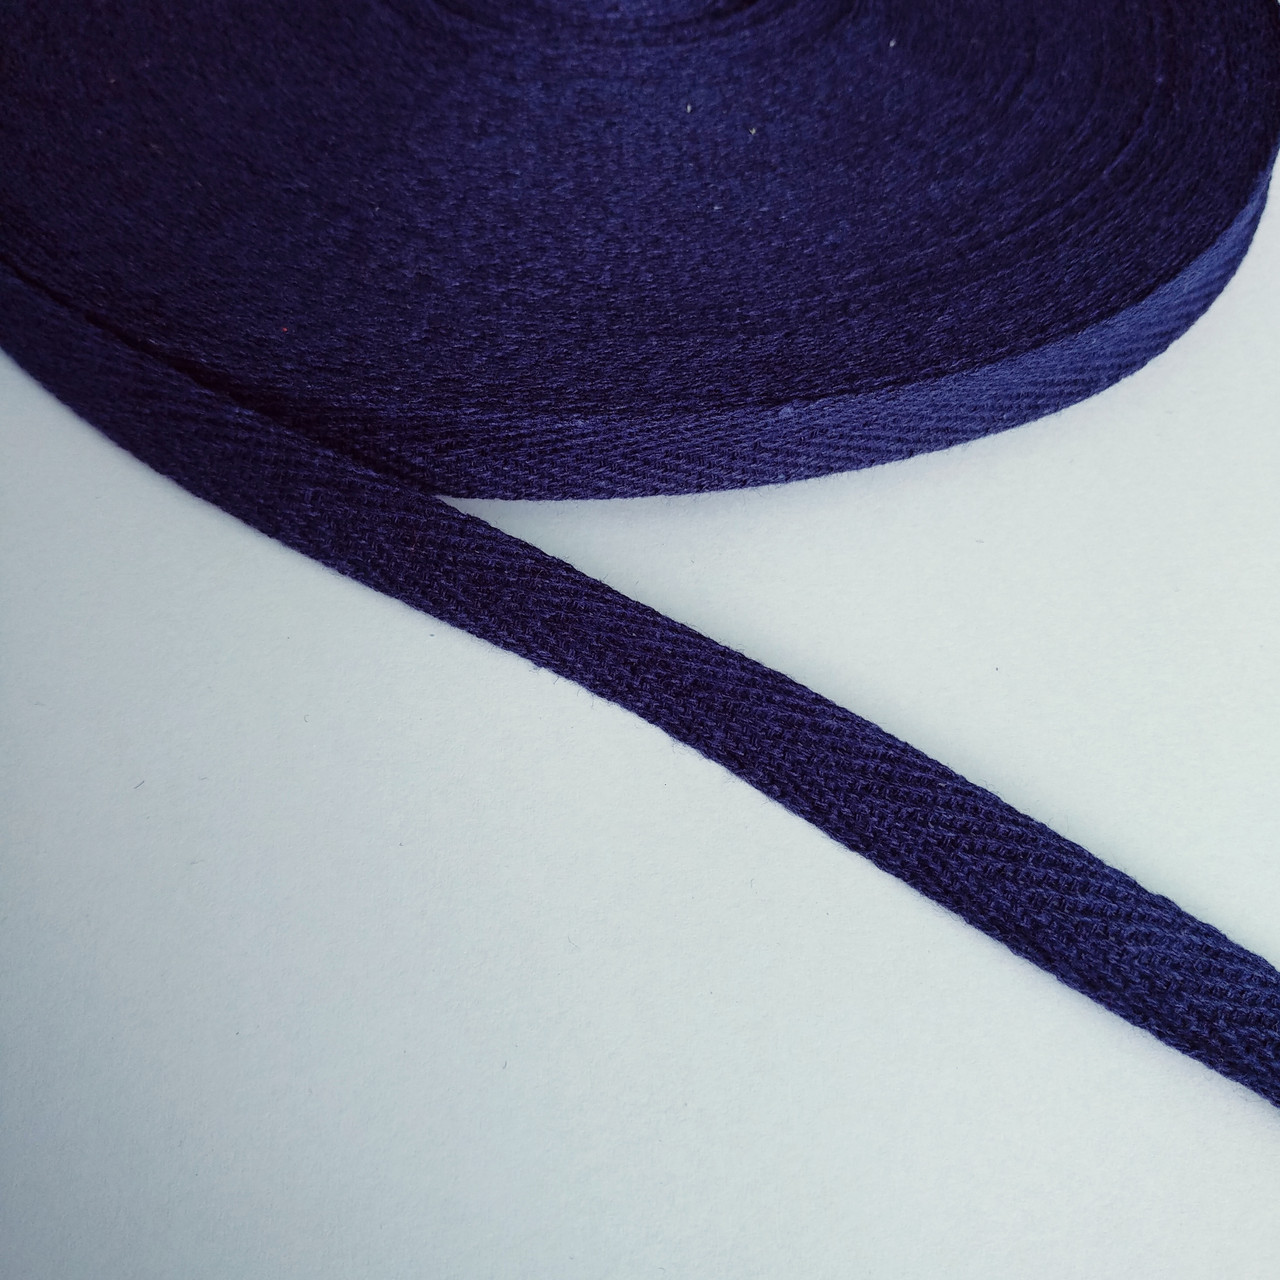 Киперная стрічка хб, 10 мм. темно синя.